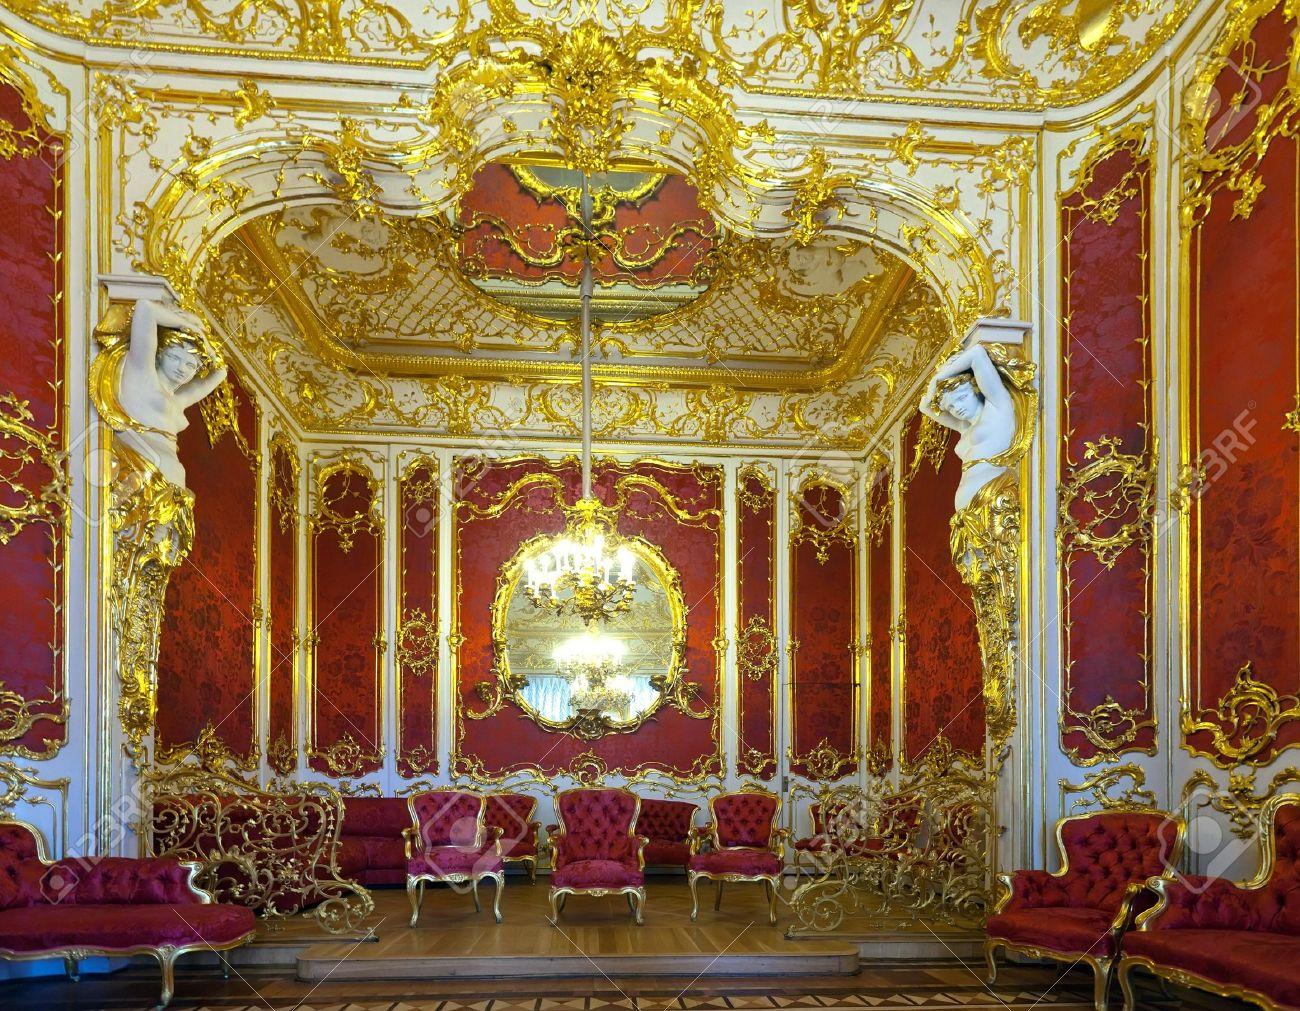 15453091-ST-PETERSBURG-RUSSIA-AUGUST-1-Interior-of-Winter-Palace-in-August-1-2012-in-St-Petersburg-Russia-Sta-Stock-Photo.jpg